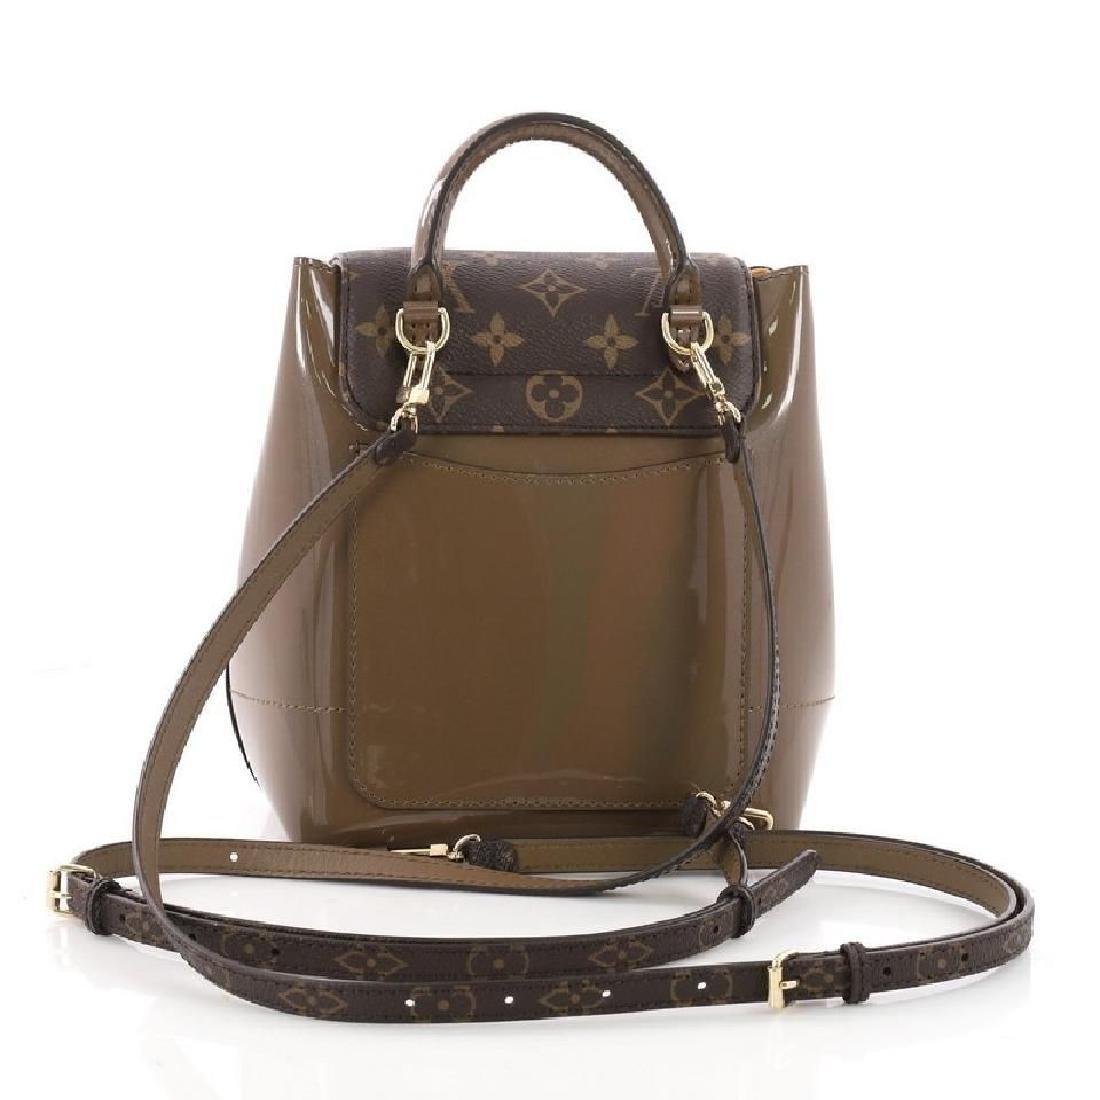 Louis Vuitton Hot Springs Vernis Monogram Backpack - 2